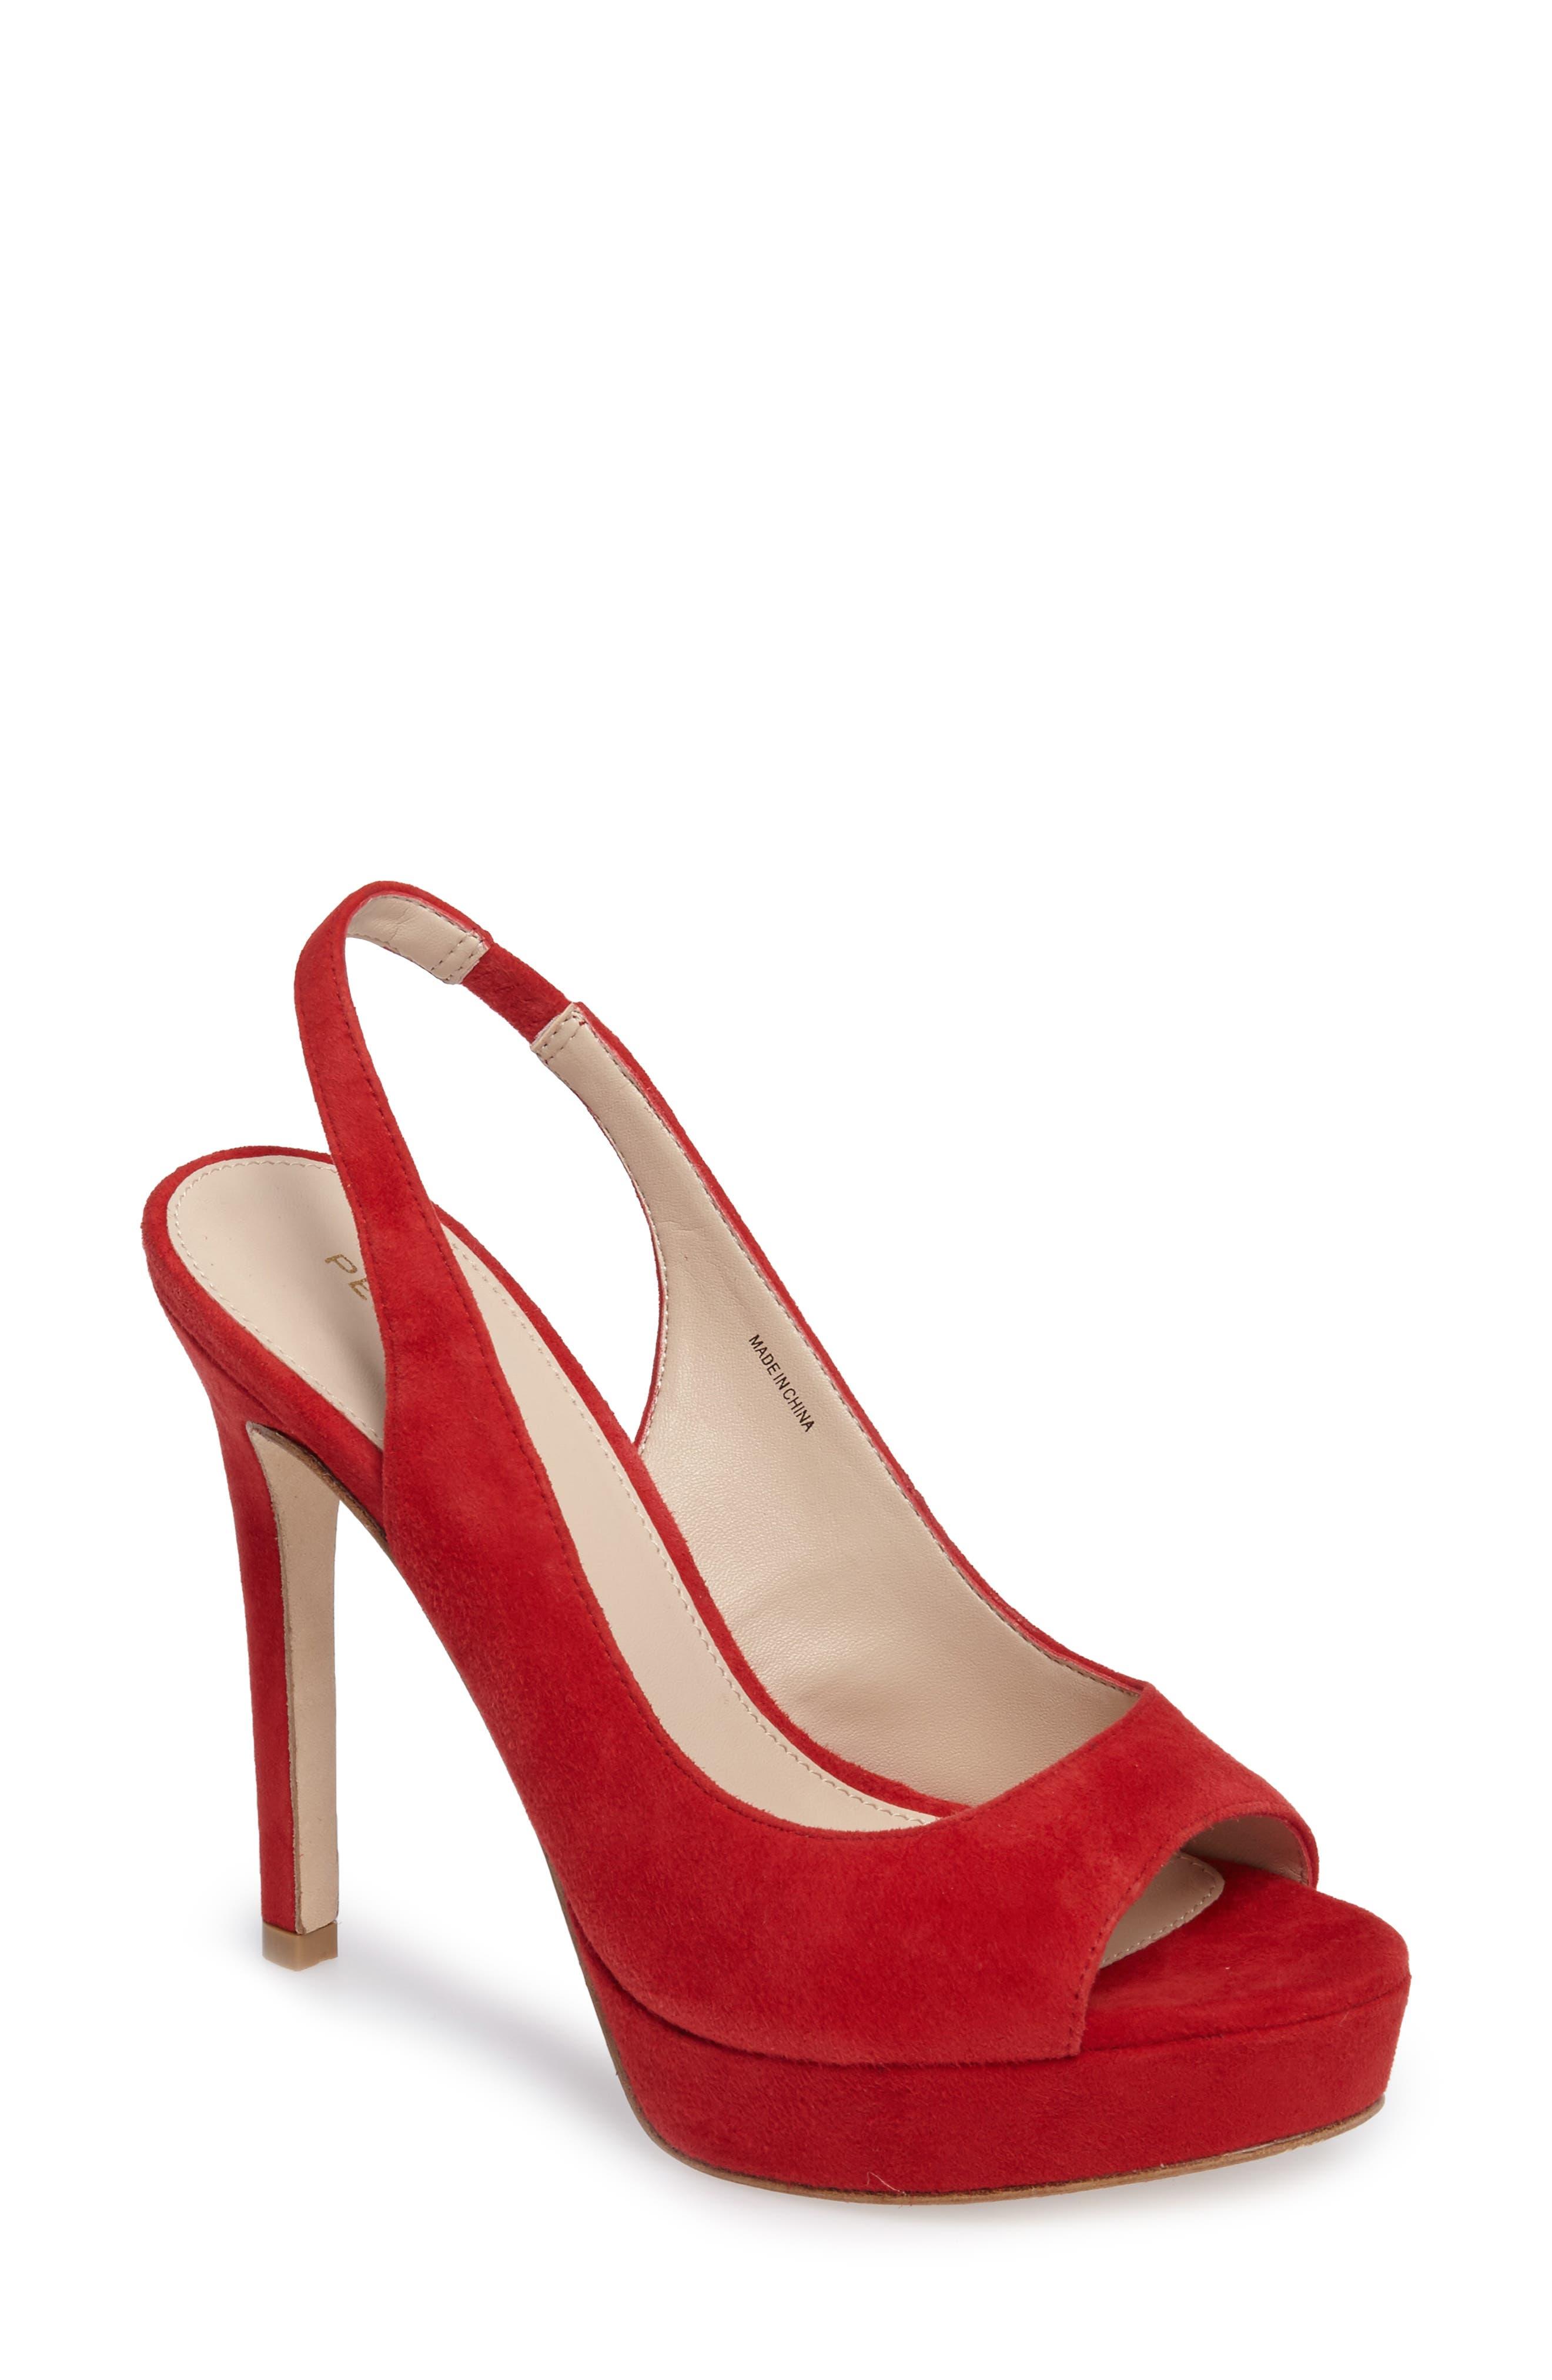 Alternate Image 1 Selected - Pelle Moda Oana Slingback Platform Sandal (Women)